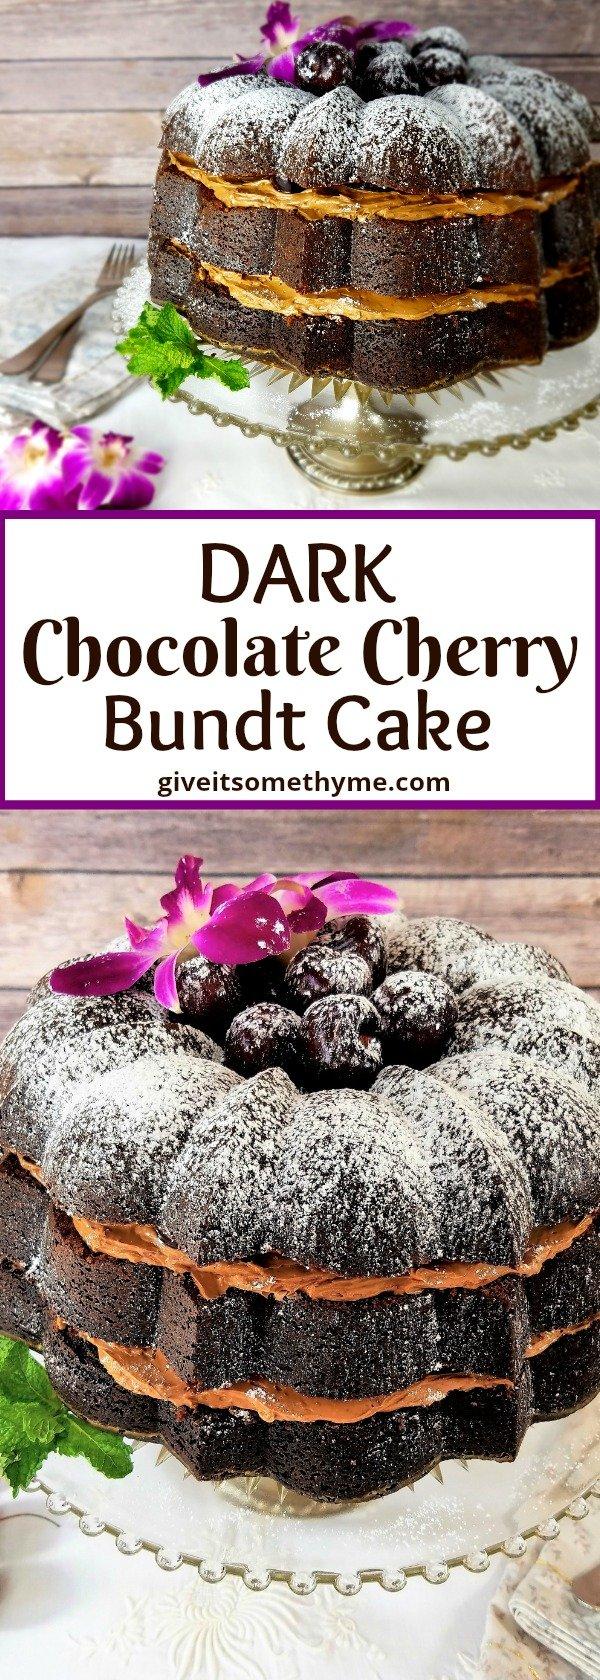 Dark Chocolate Cherry Bundt Cake | Give it Some Thyme